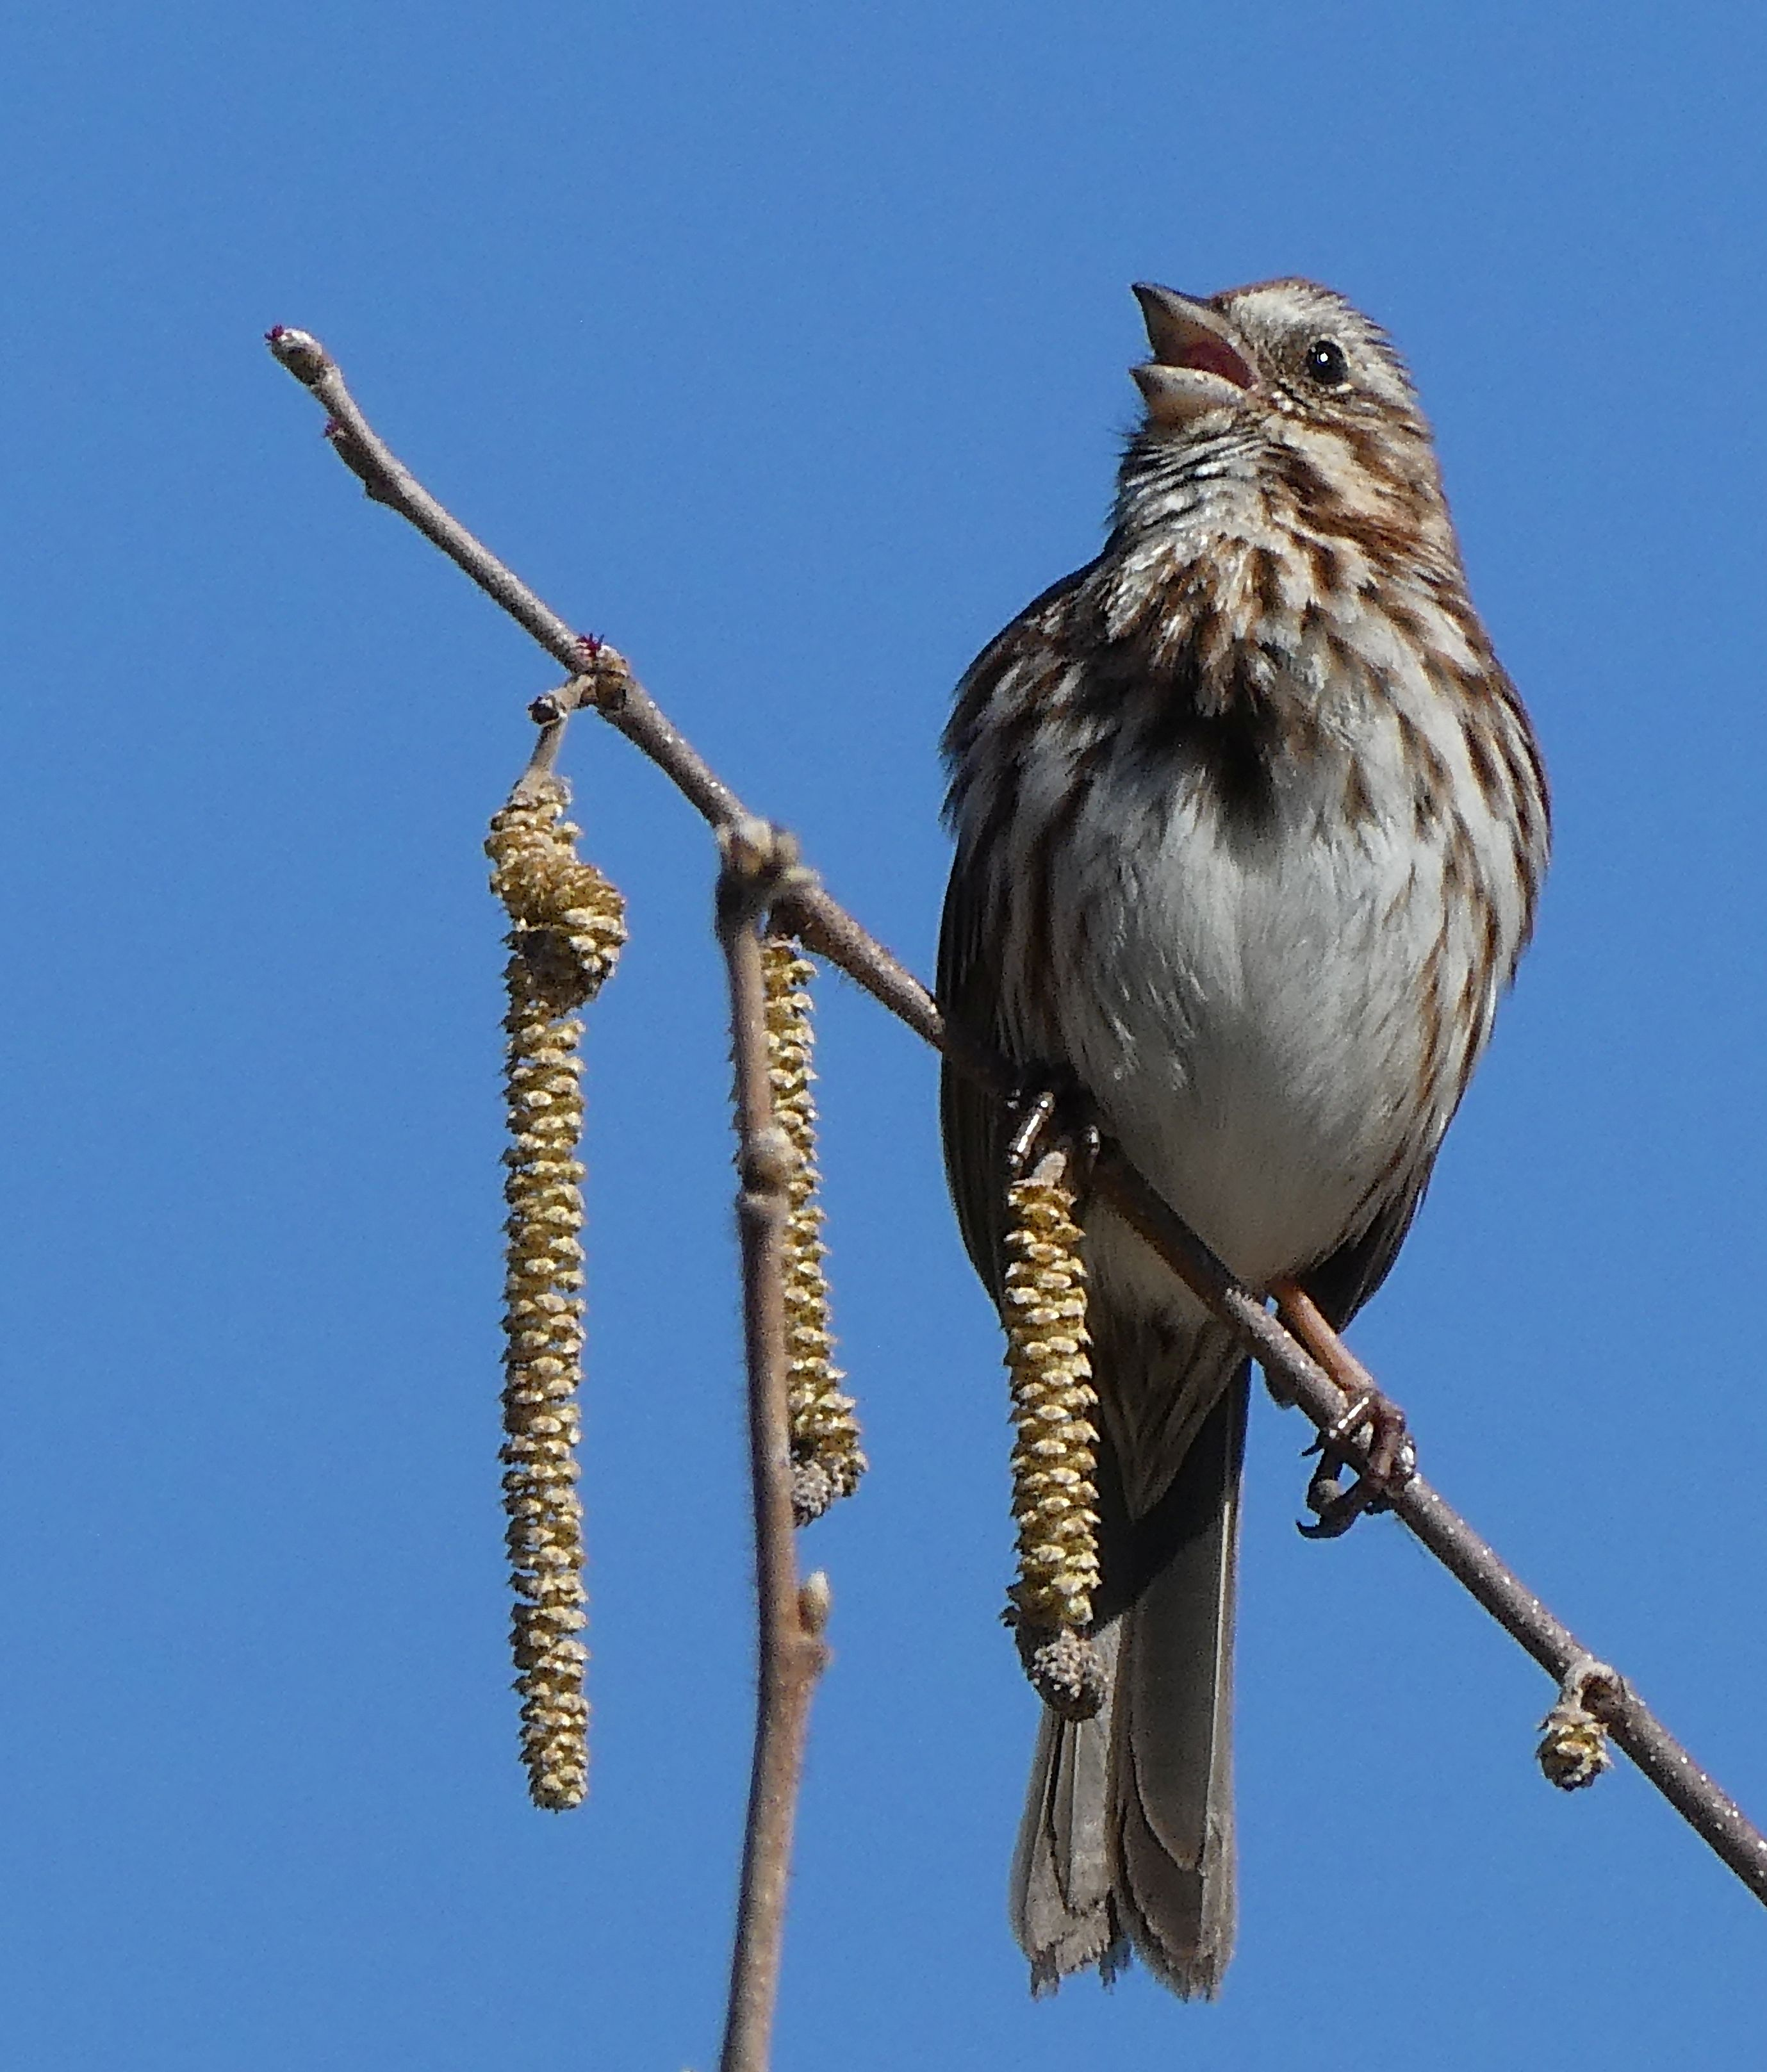 1 Sparrow singing